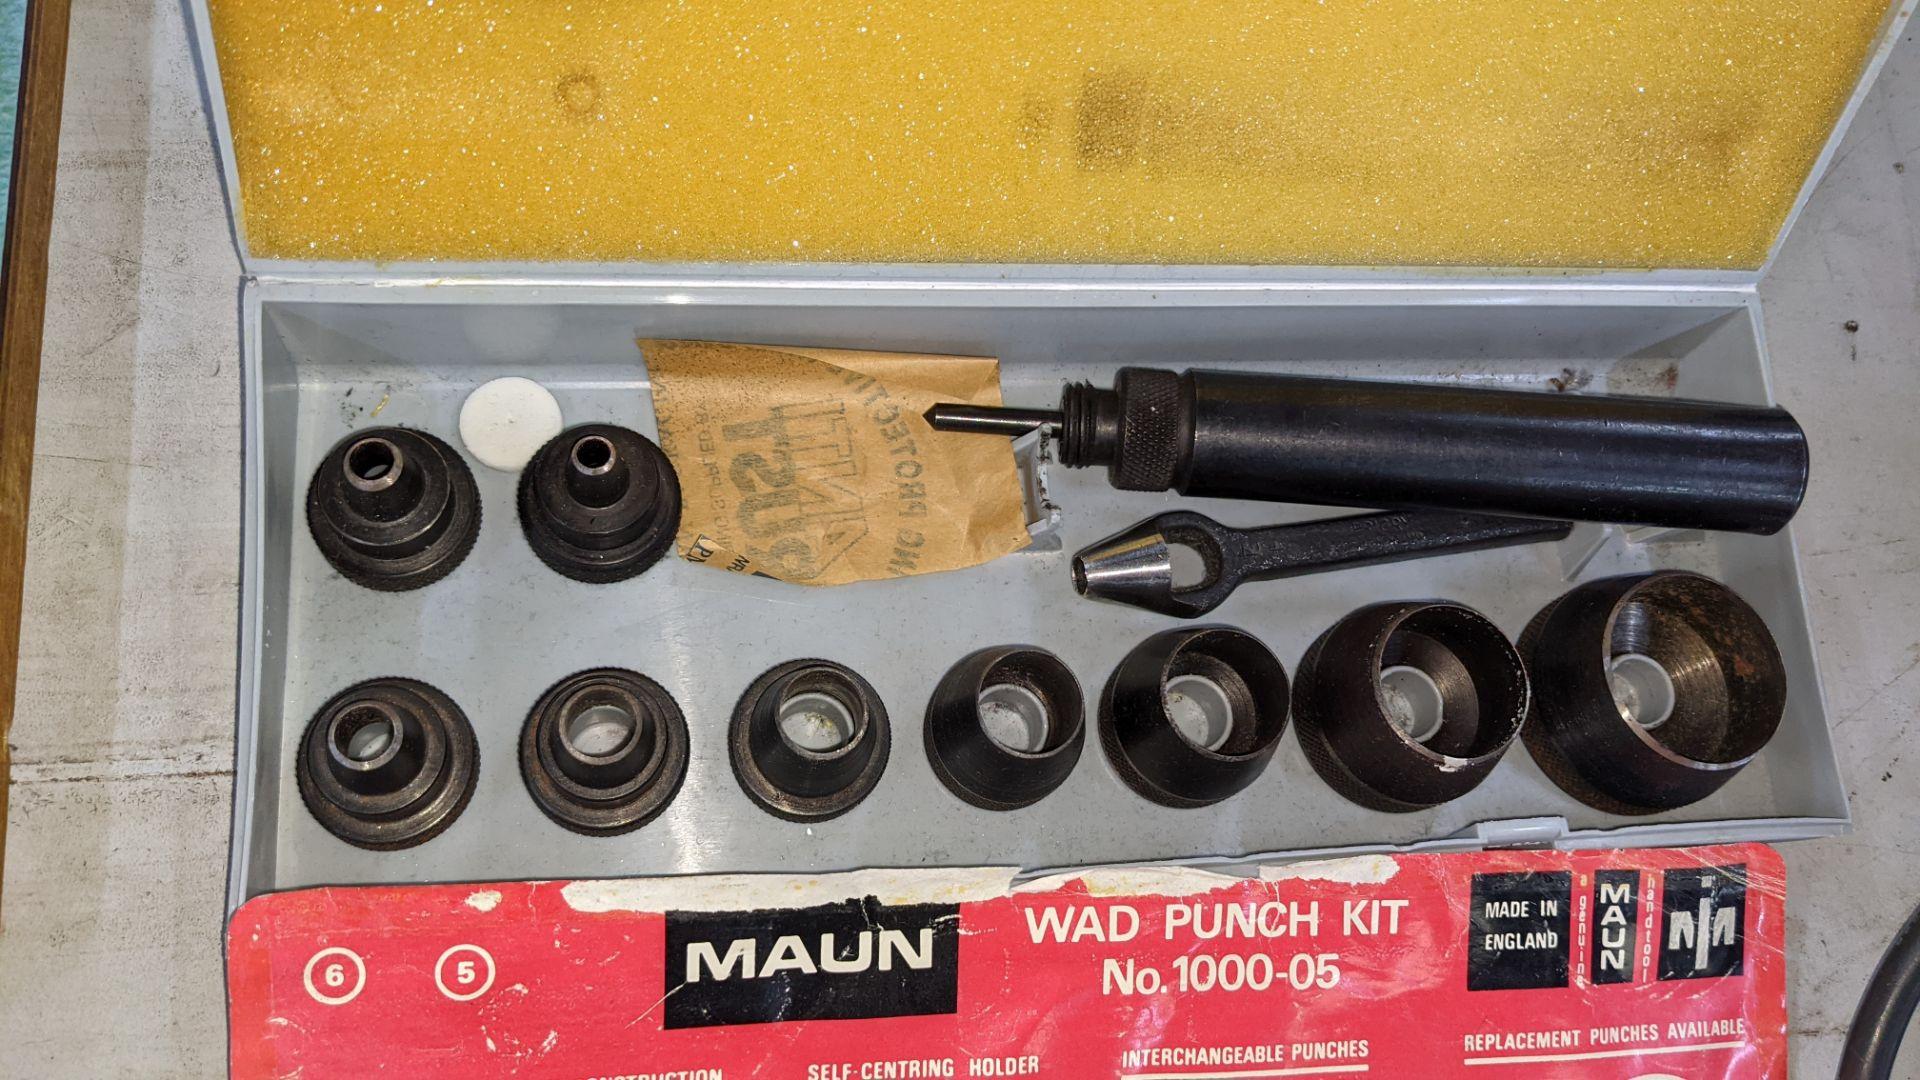 Maun wad punch kit number 1000-05 - Image 3 of 4